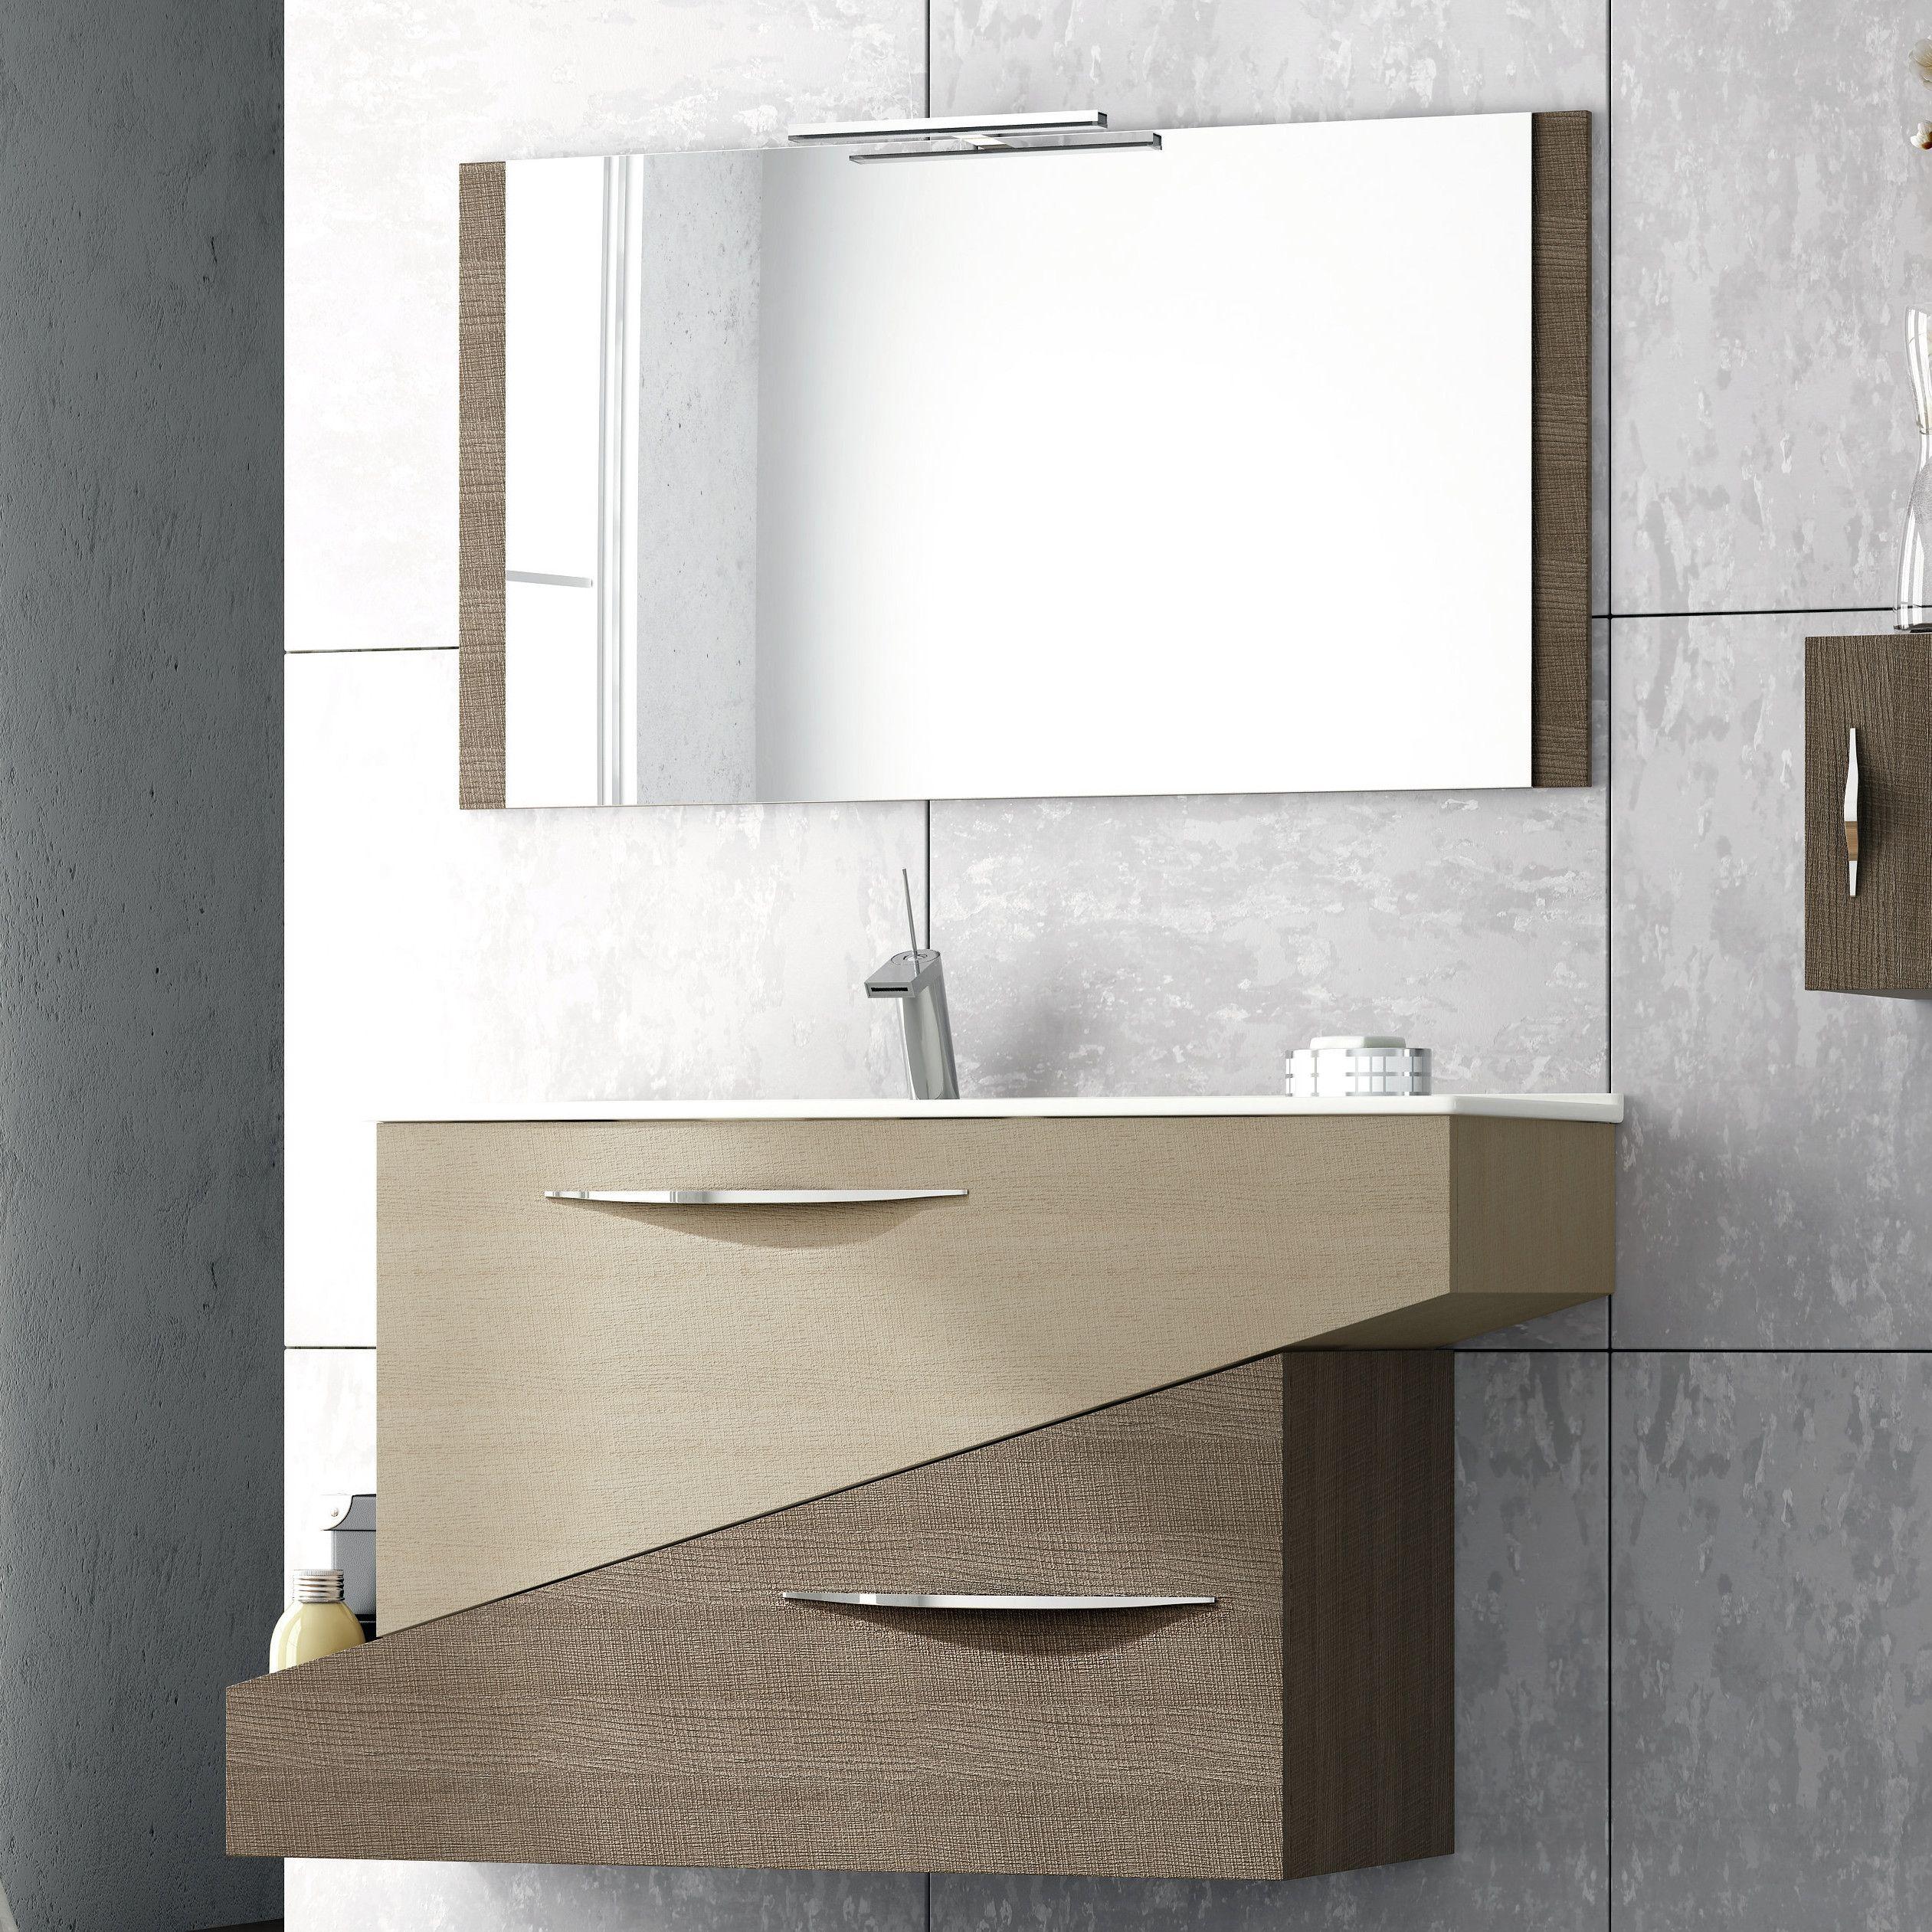 38 Inch Bathroom Vanity   38 Inch Modern Wood Bathroom Vanity Set Bathroom Ideas